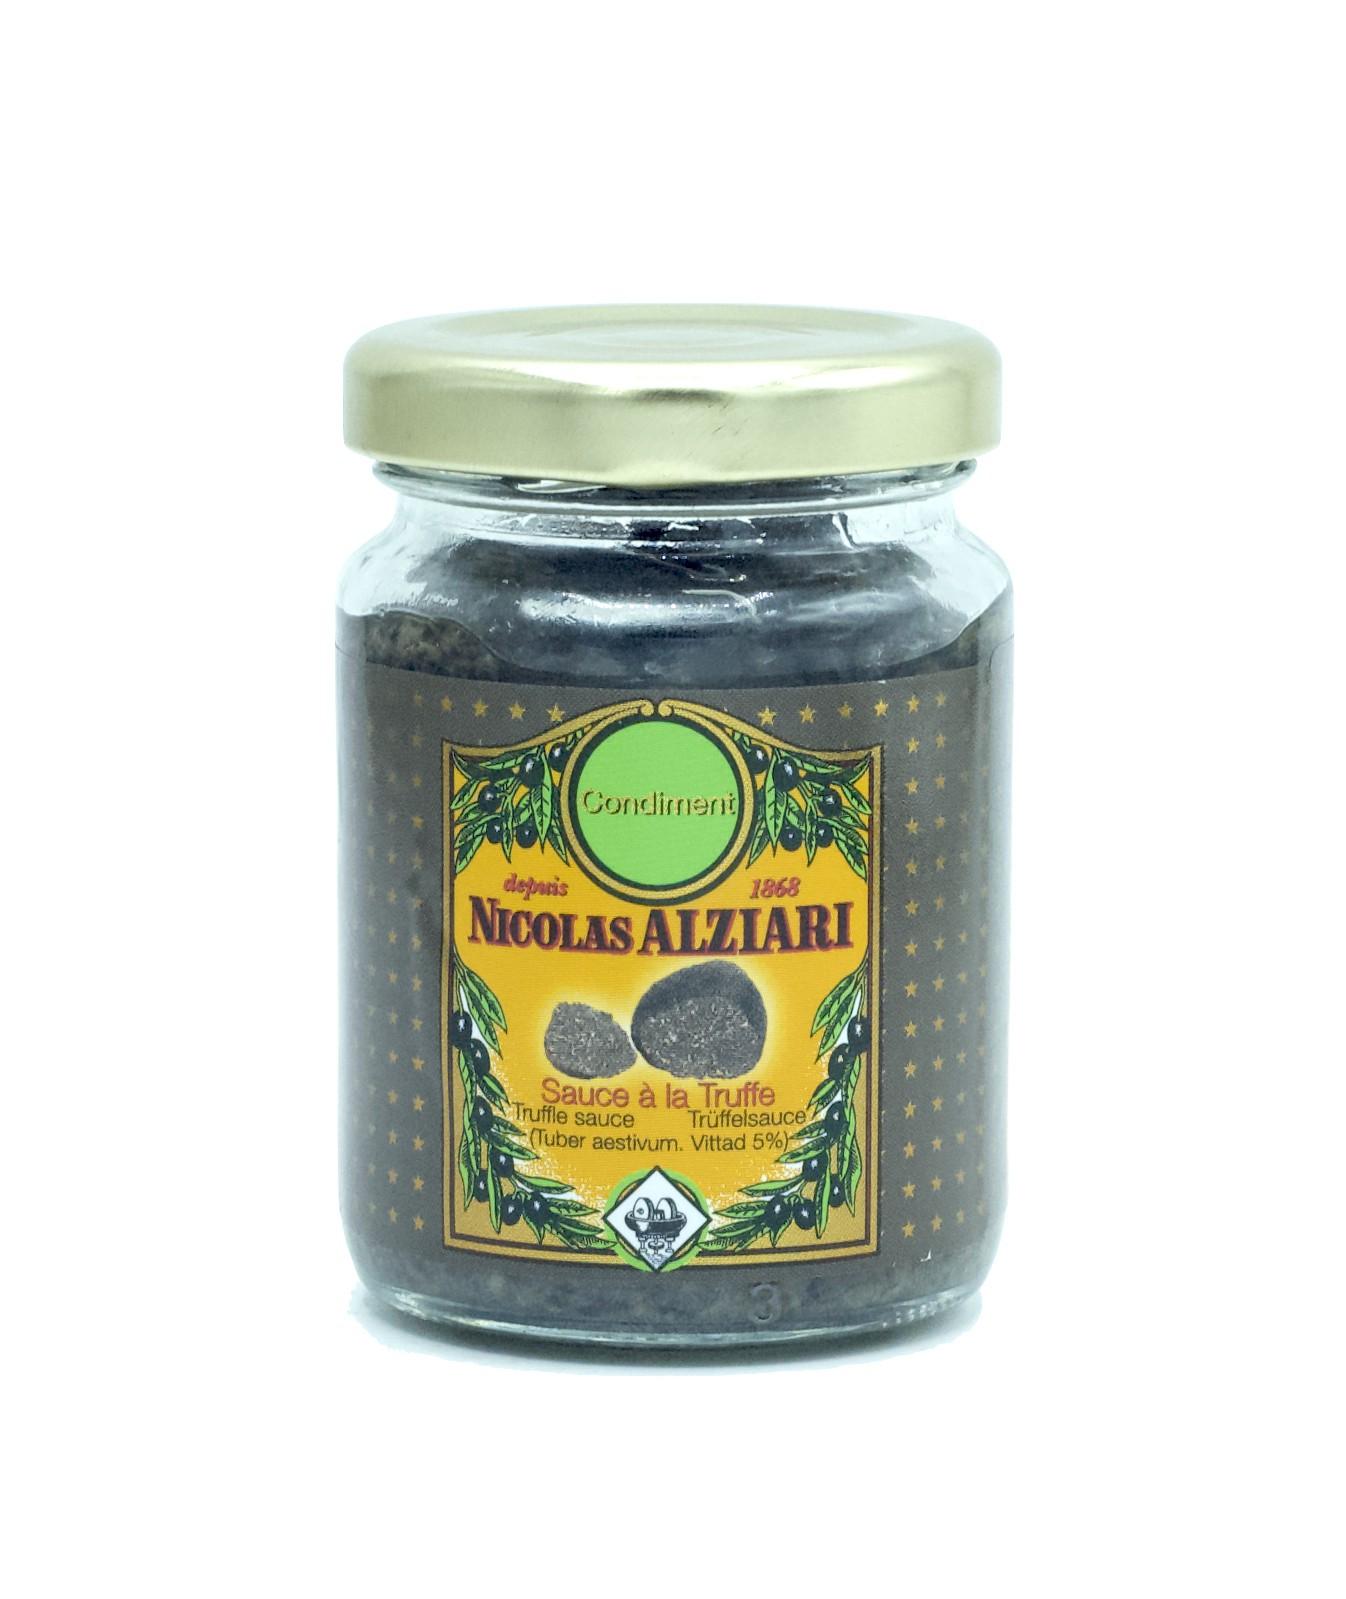 Sauce à la Truffe 80 g (Tuber aestivum, Vittad 5%)